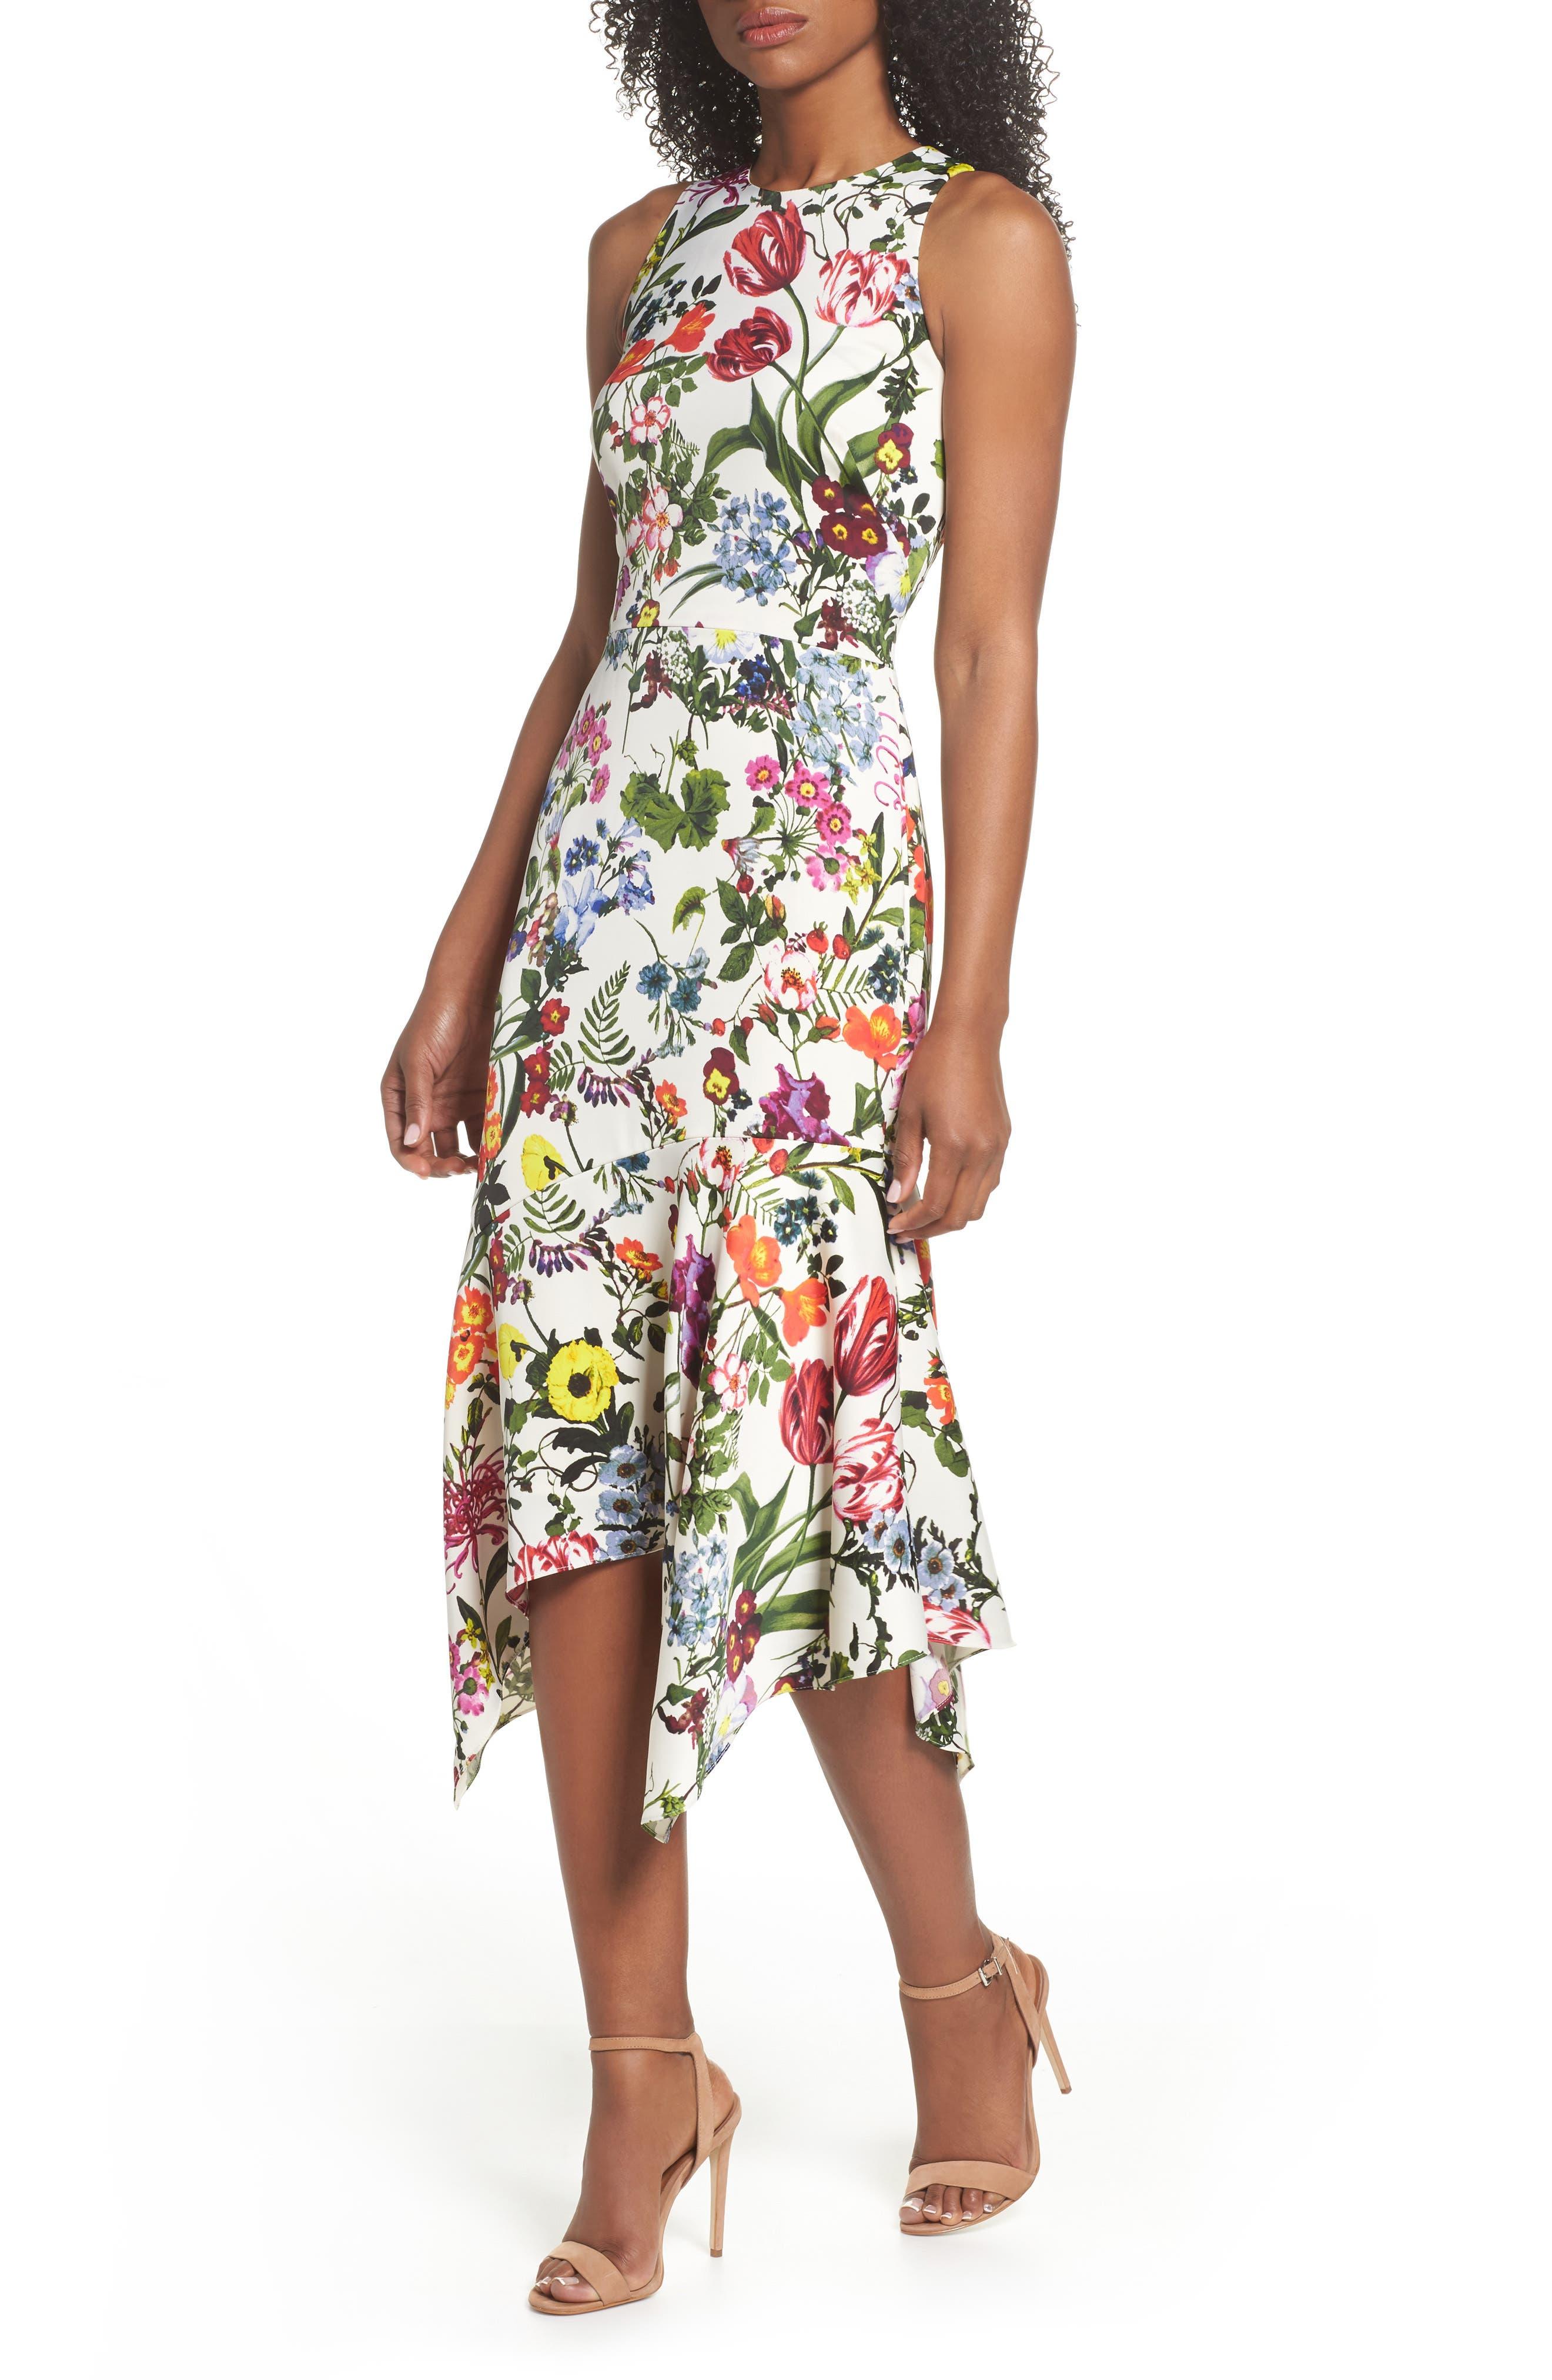 Botanical Print Charmeuse Midi Dress,                         Main,                         color, Soft White/ Multi